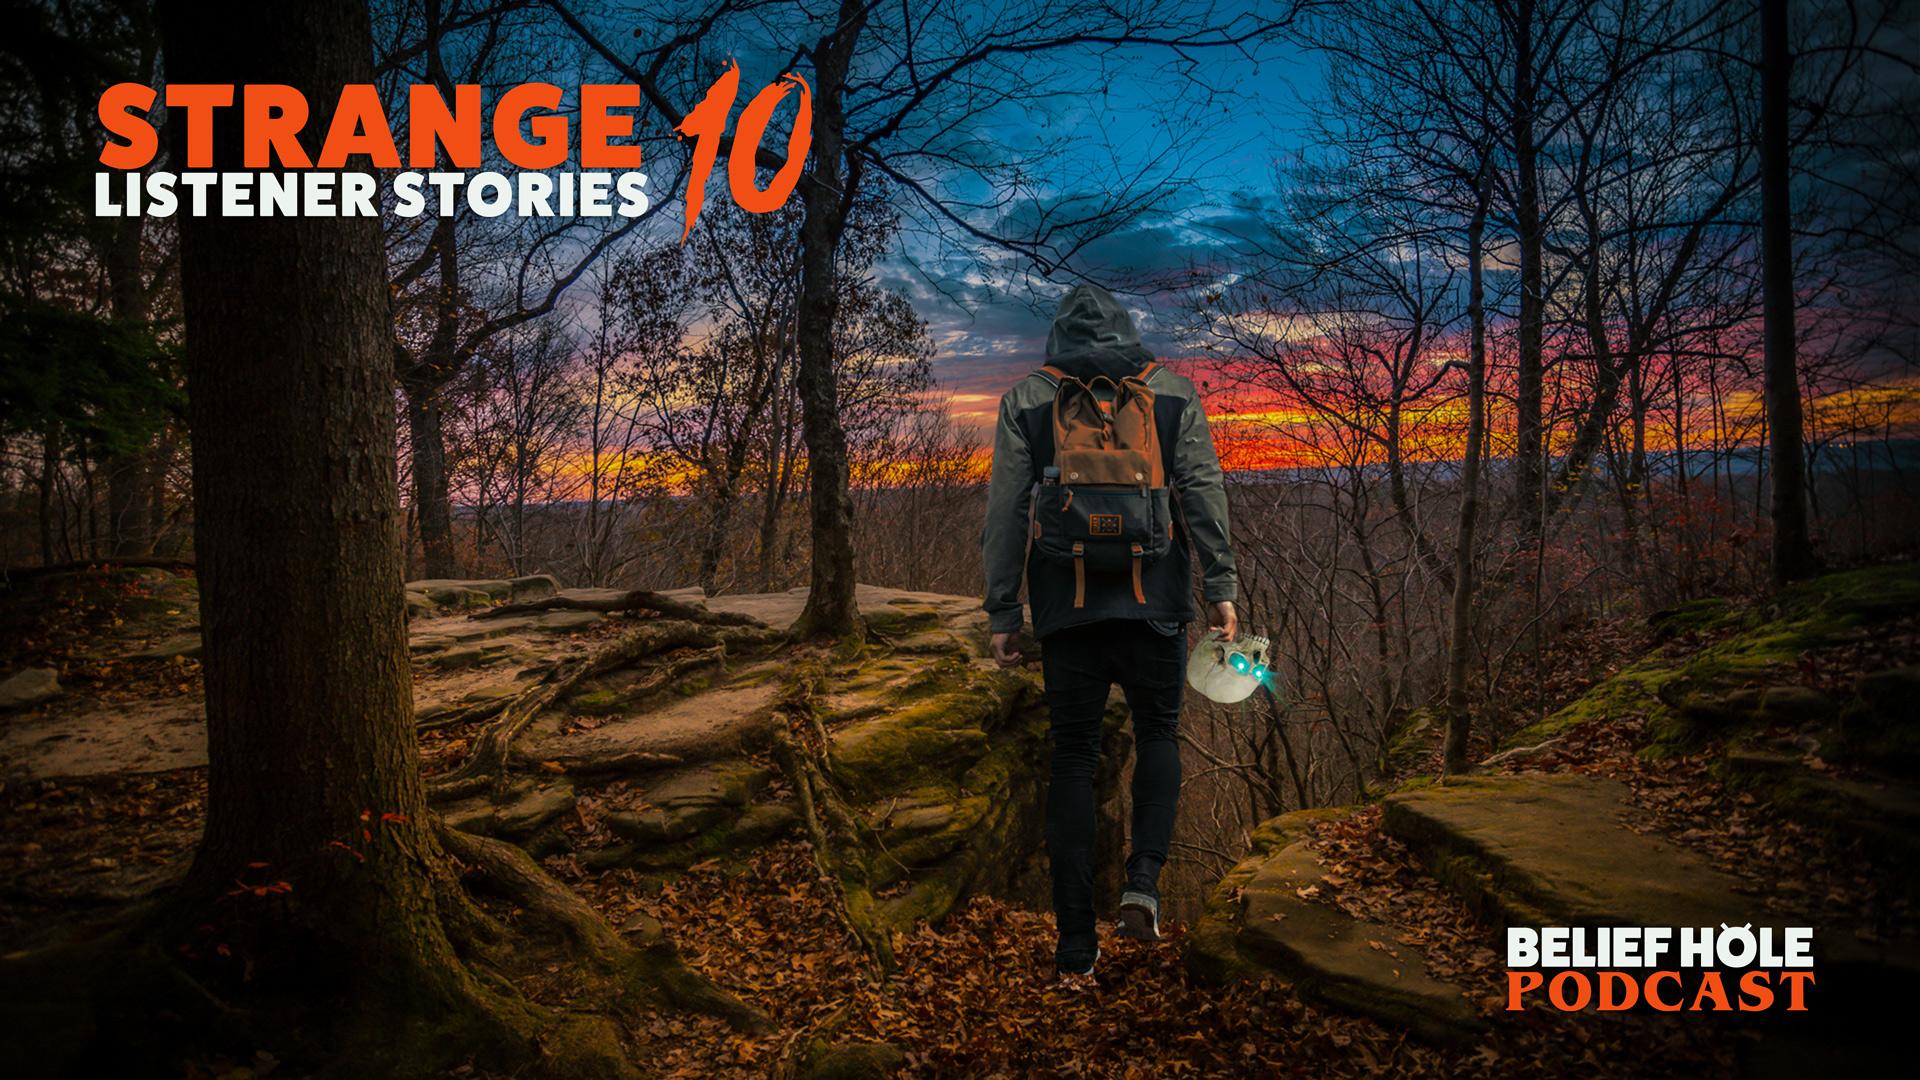 True-Paranormal-Strange-Listerner-Stories-10-huanted-skulls-ufo-encounter-nimitz-ufo-sighting-house-ghost-Kikimora-medium-spooky-cuyahoga-valley-belief-hole-podcast-3.14